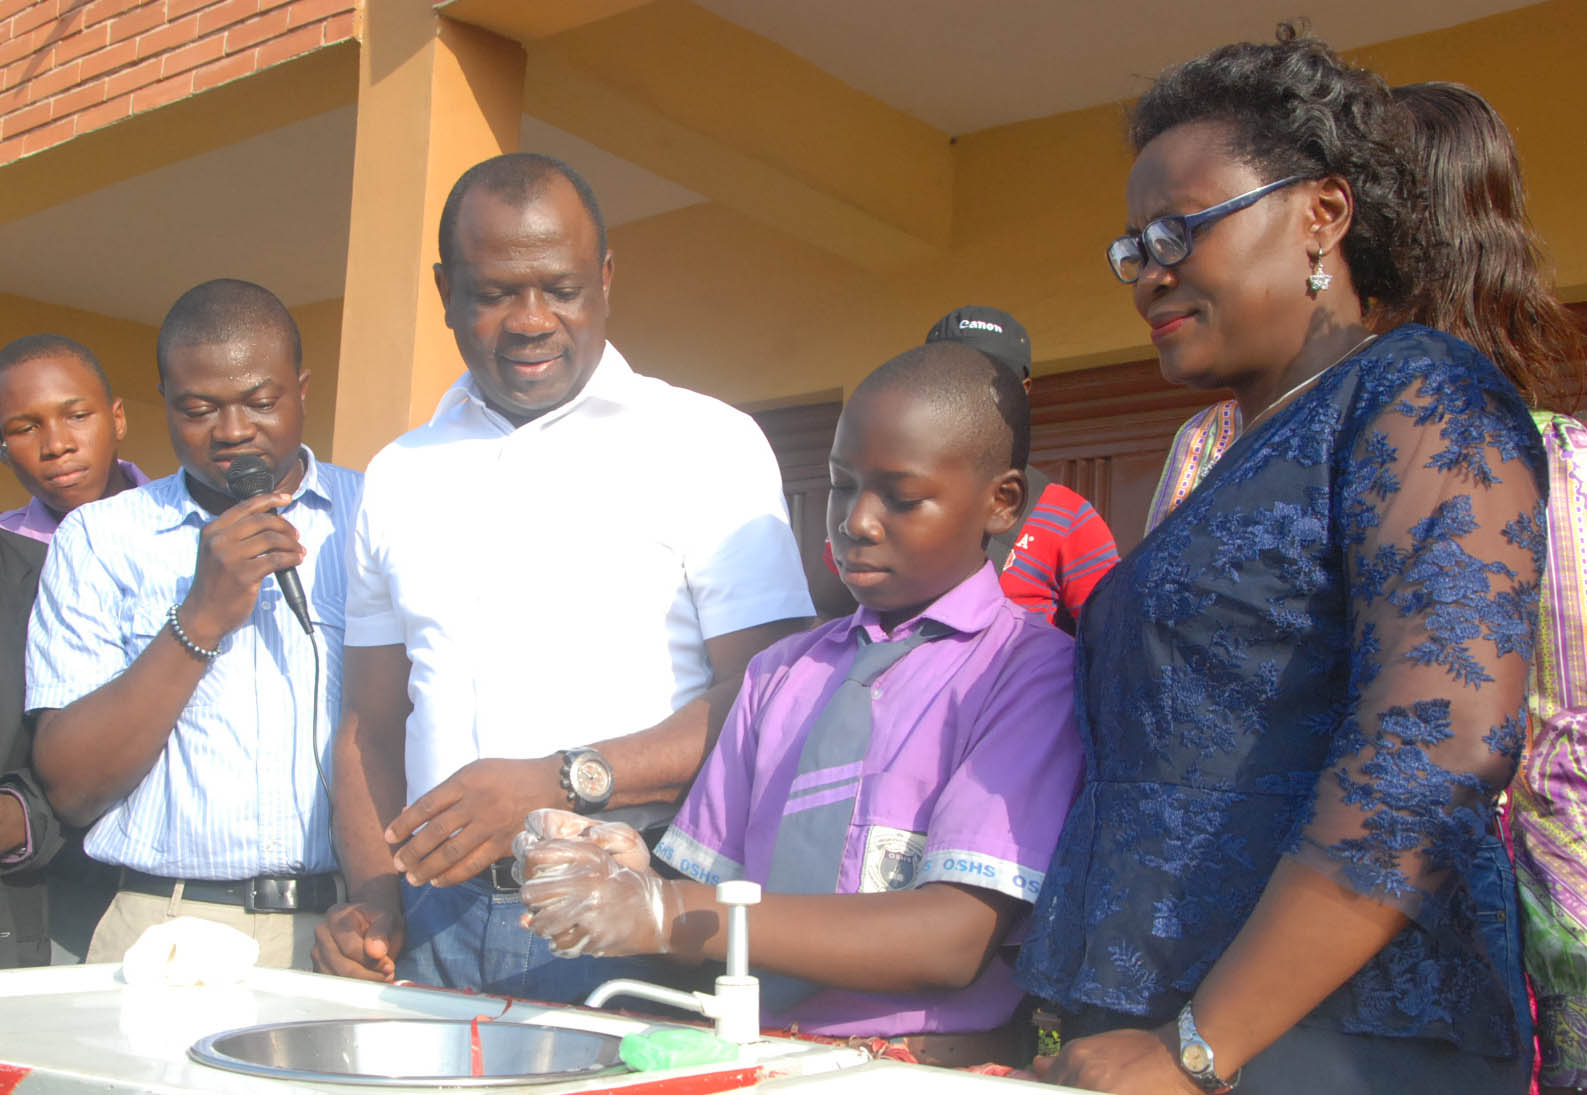 Unilever handwashing activity at Oregun High school 1